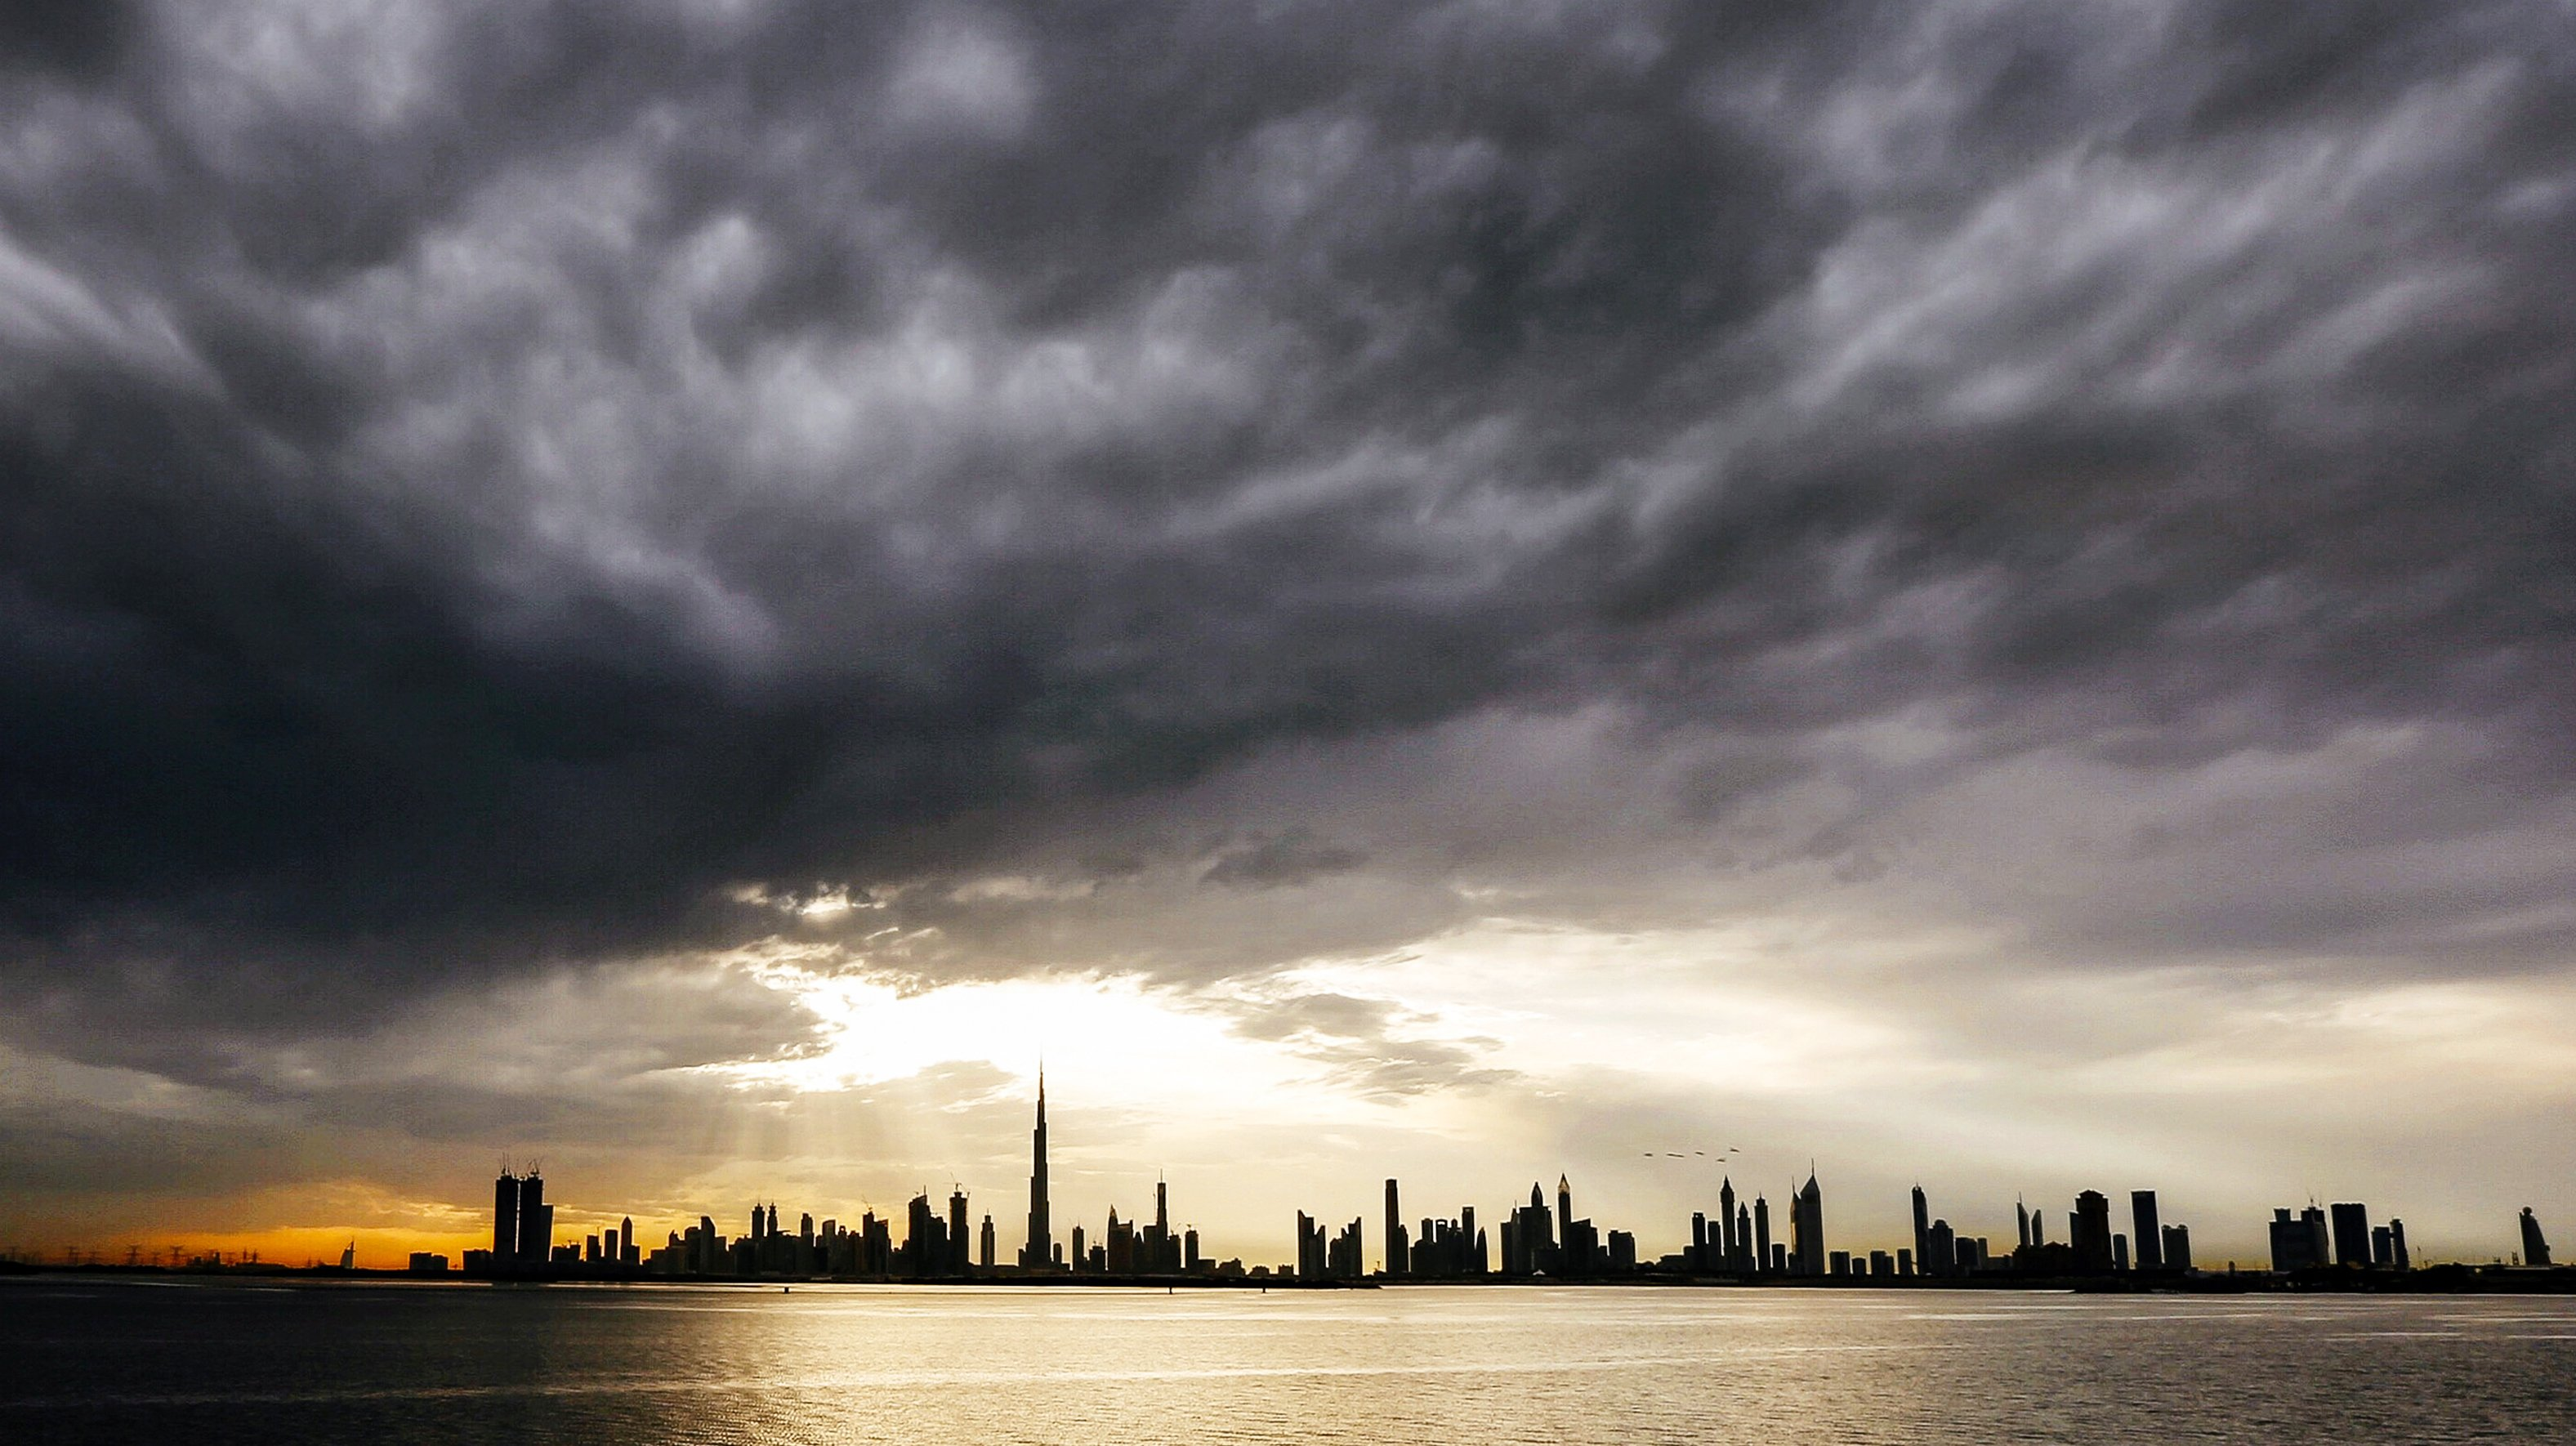 Views of the Dubai skyline in the UAE